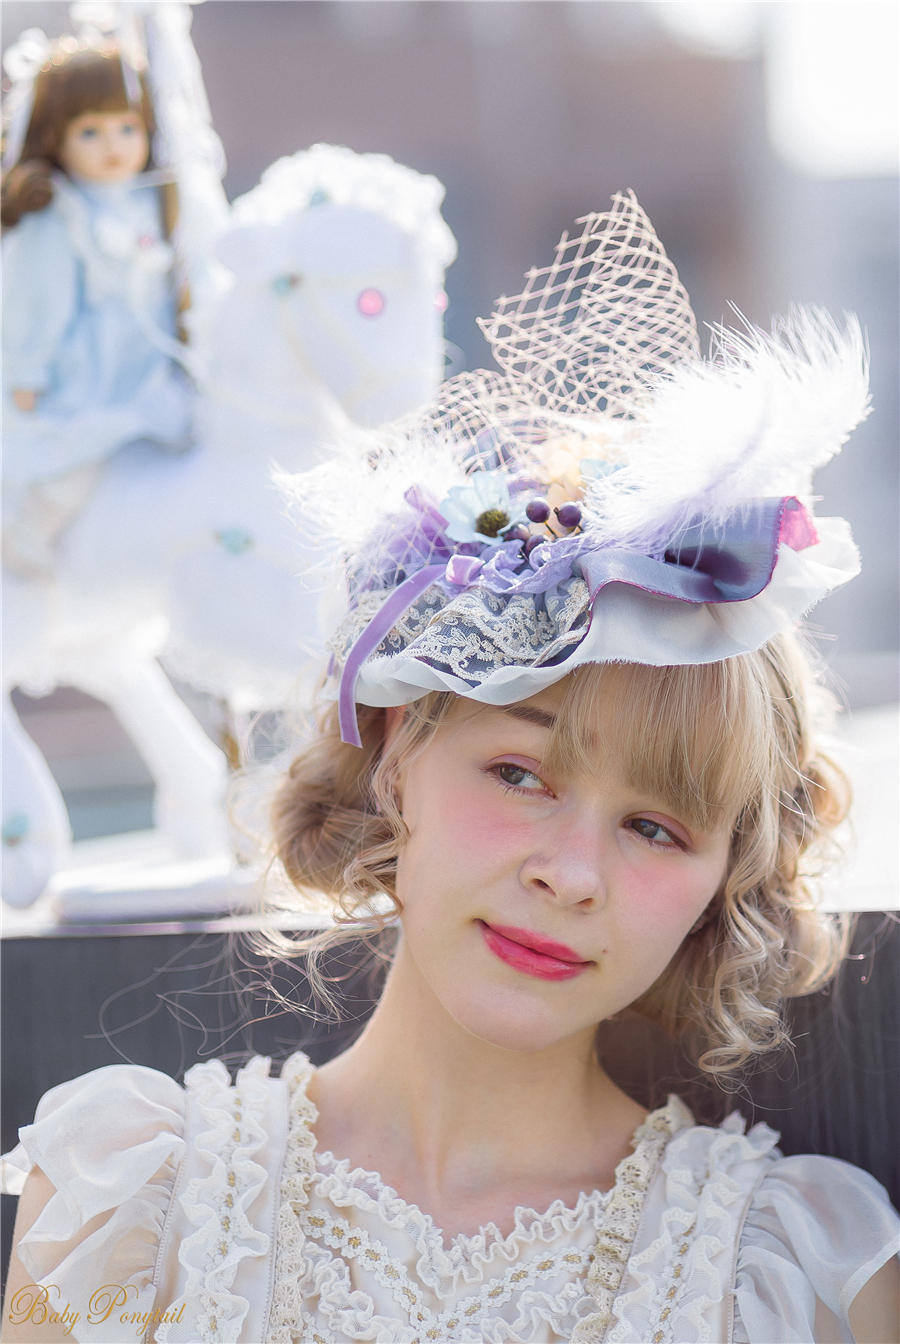 Babyponytail_Present Angel_JSK_Claudia0.jpg